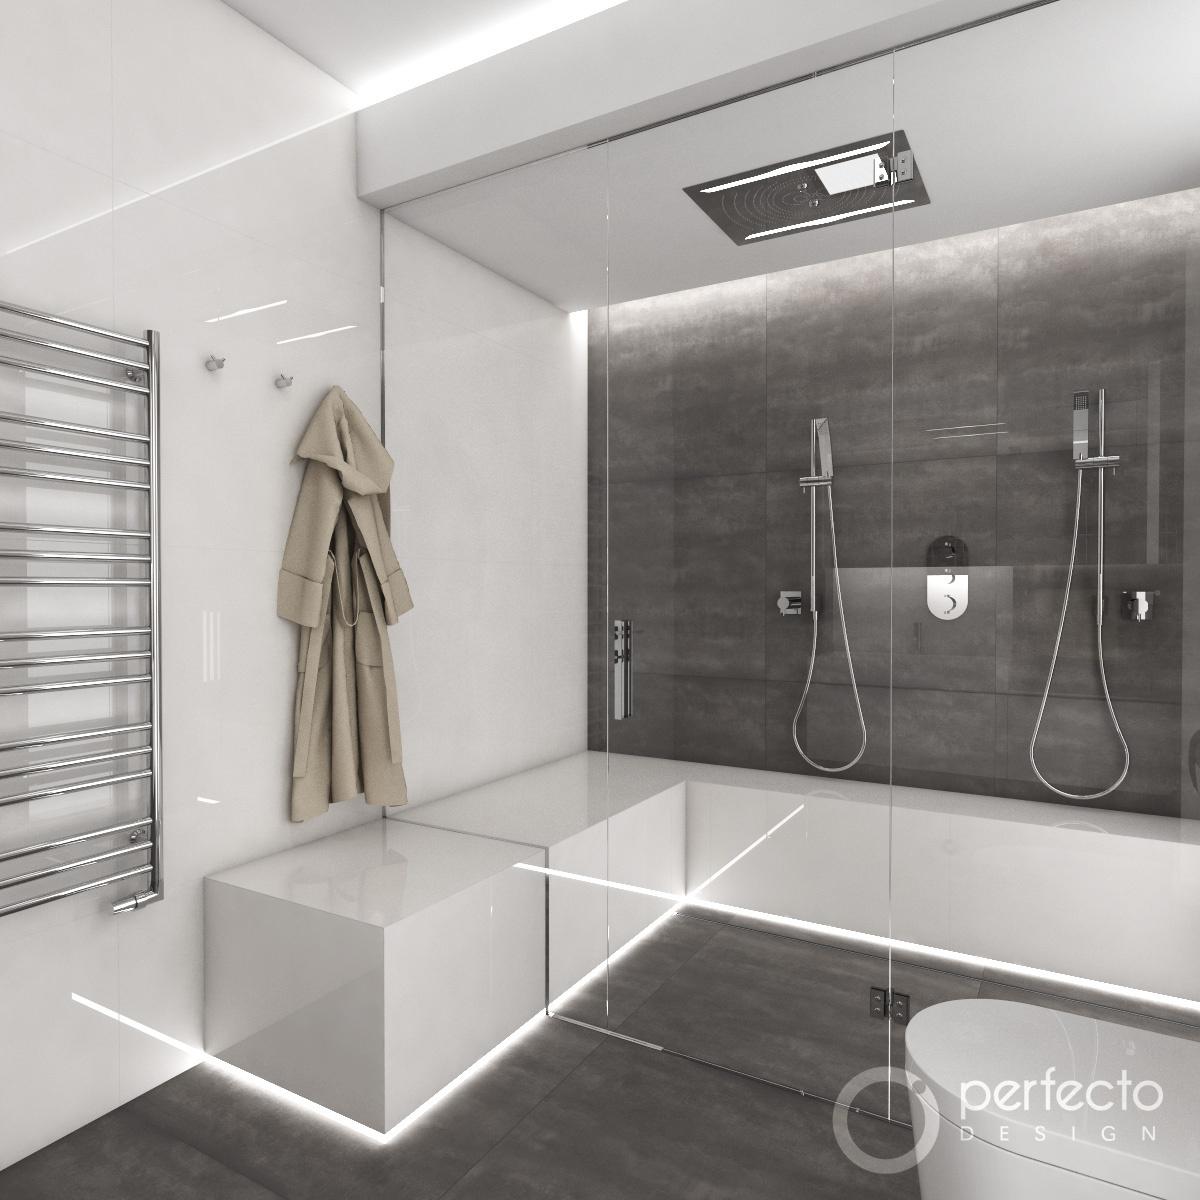 Modernes Badezimmer MINIMAL | Perfecto design